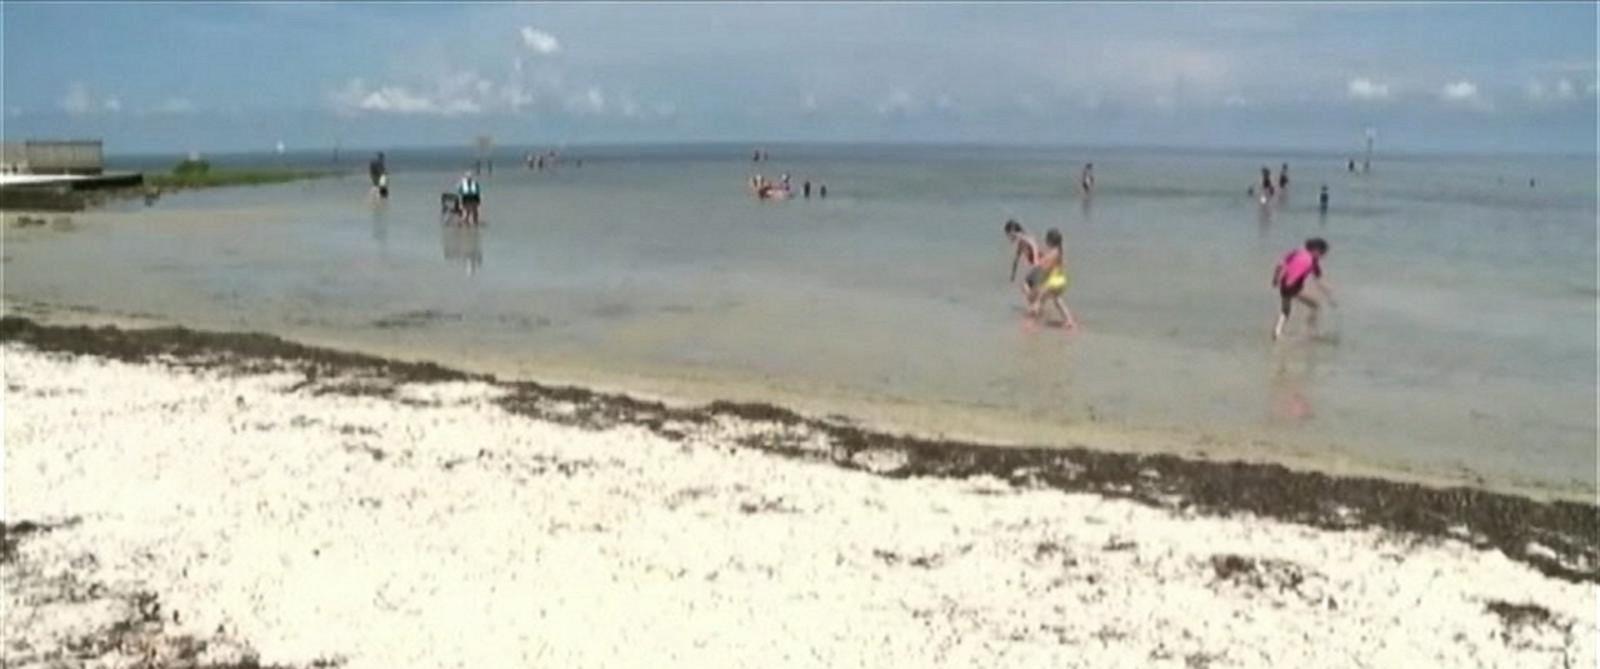 PHOTO: A screen shot from a video showing Pine Island Beach, Fla.